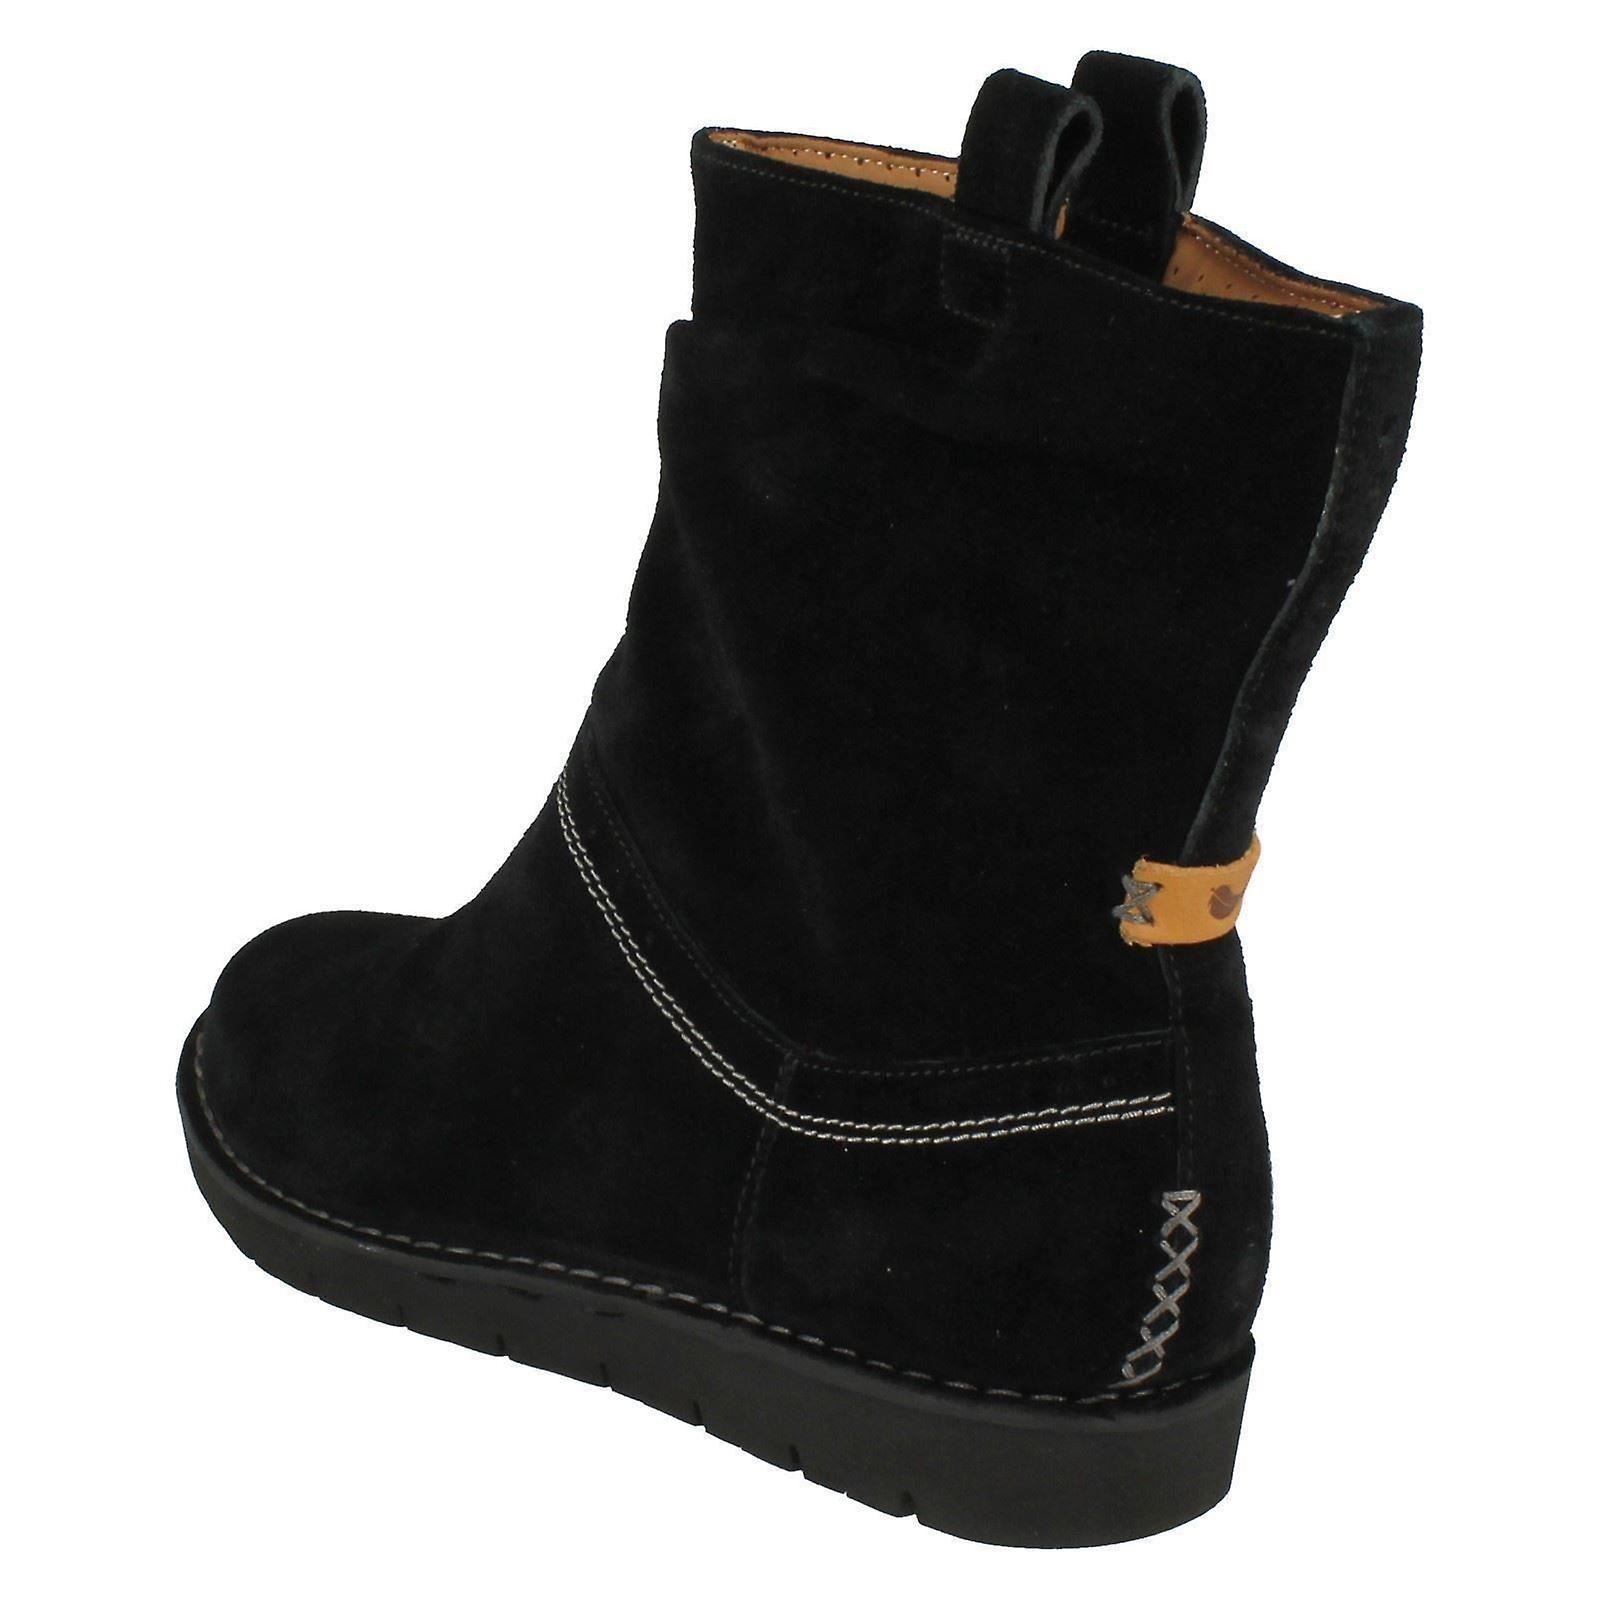 1a94263abbd21 Ladies Clarks Un Structured Slouch Short Boots Un Ashburn | Fruugo